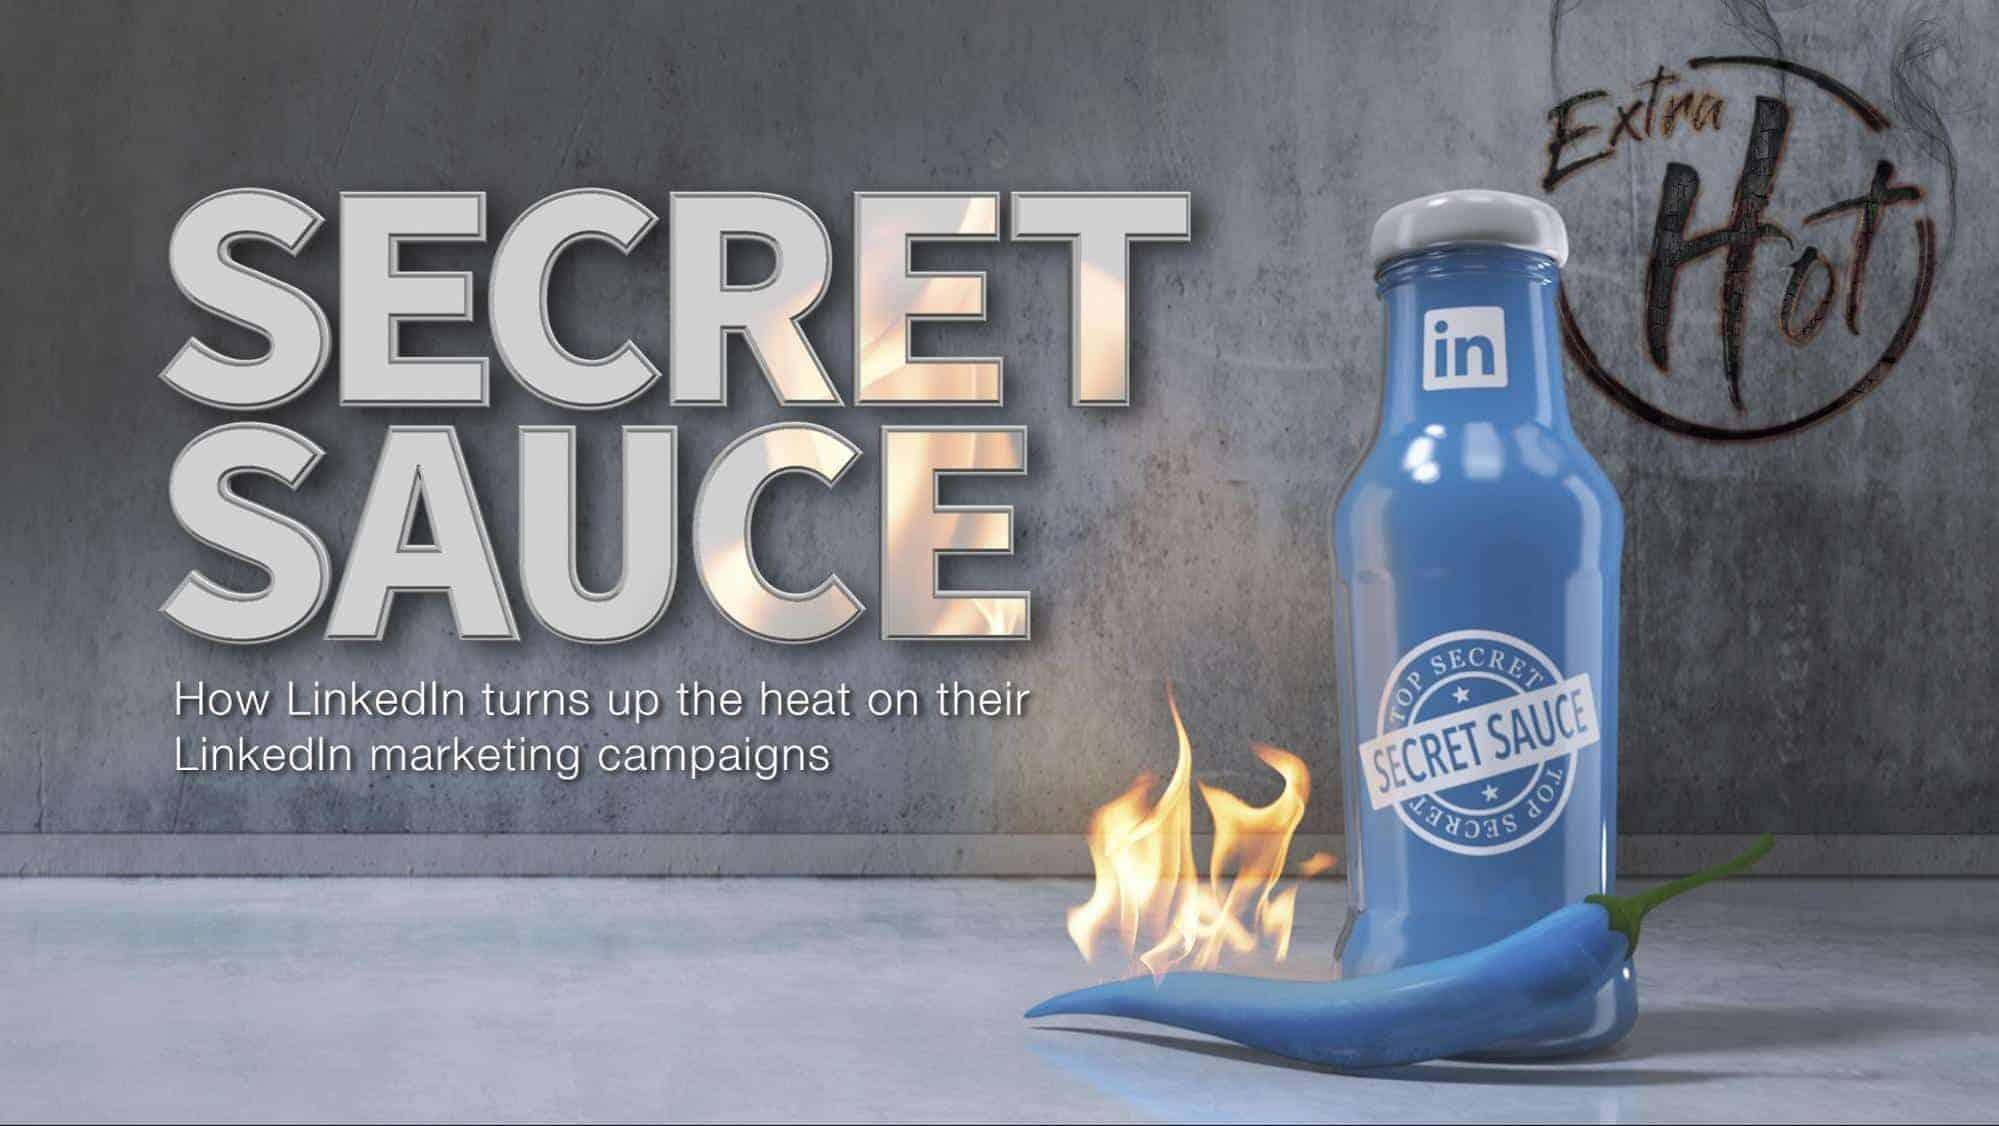 secret sauce linkedin free ebook, book cover inspiration, free book example